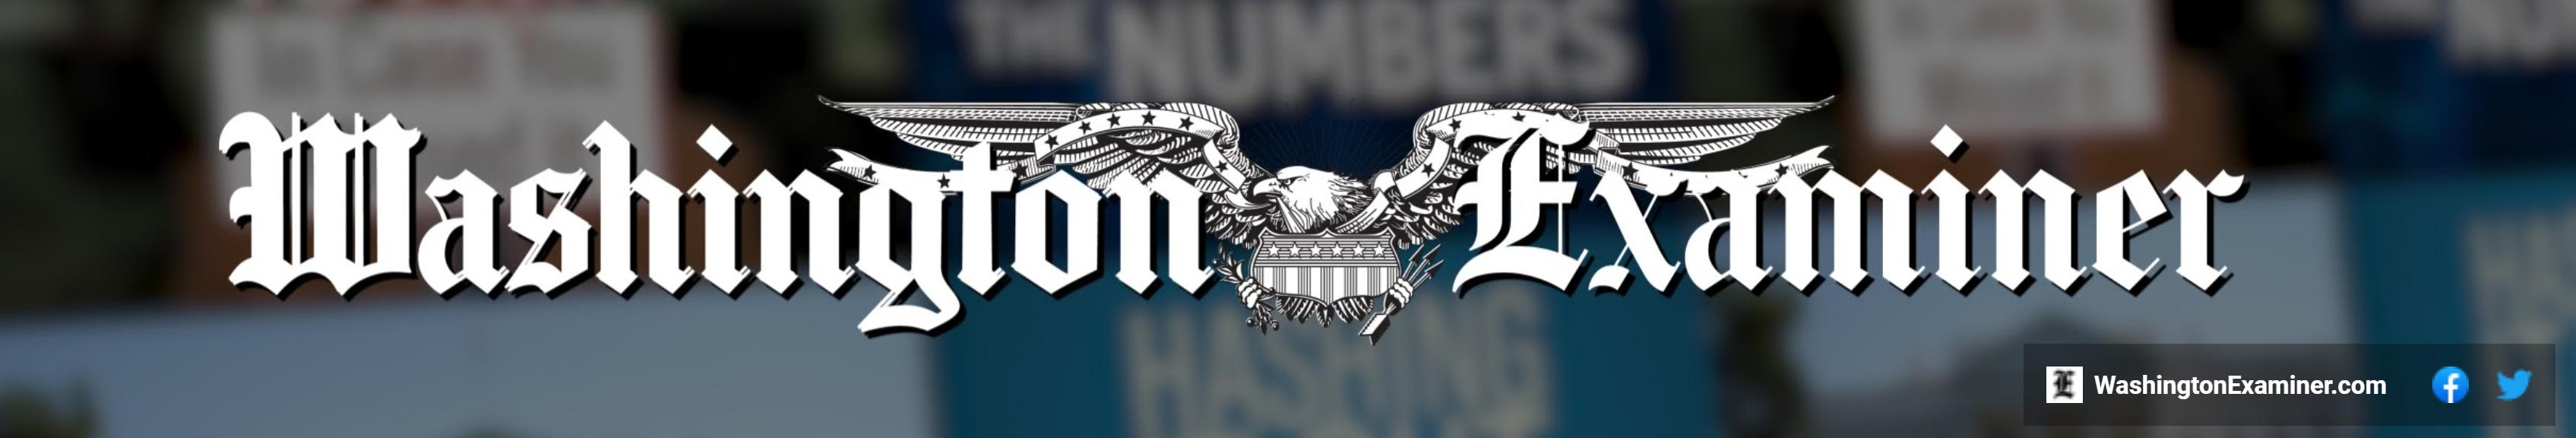 Byron York's Daily Memo: The FBI, the Michigan kidnap plot, and January 6